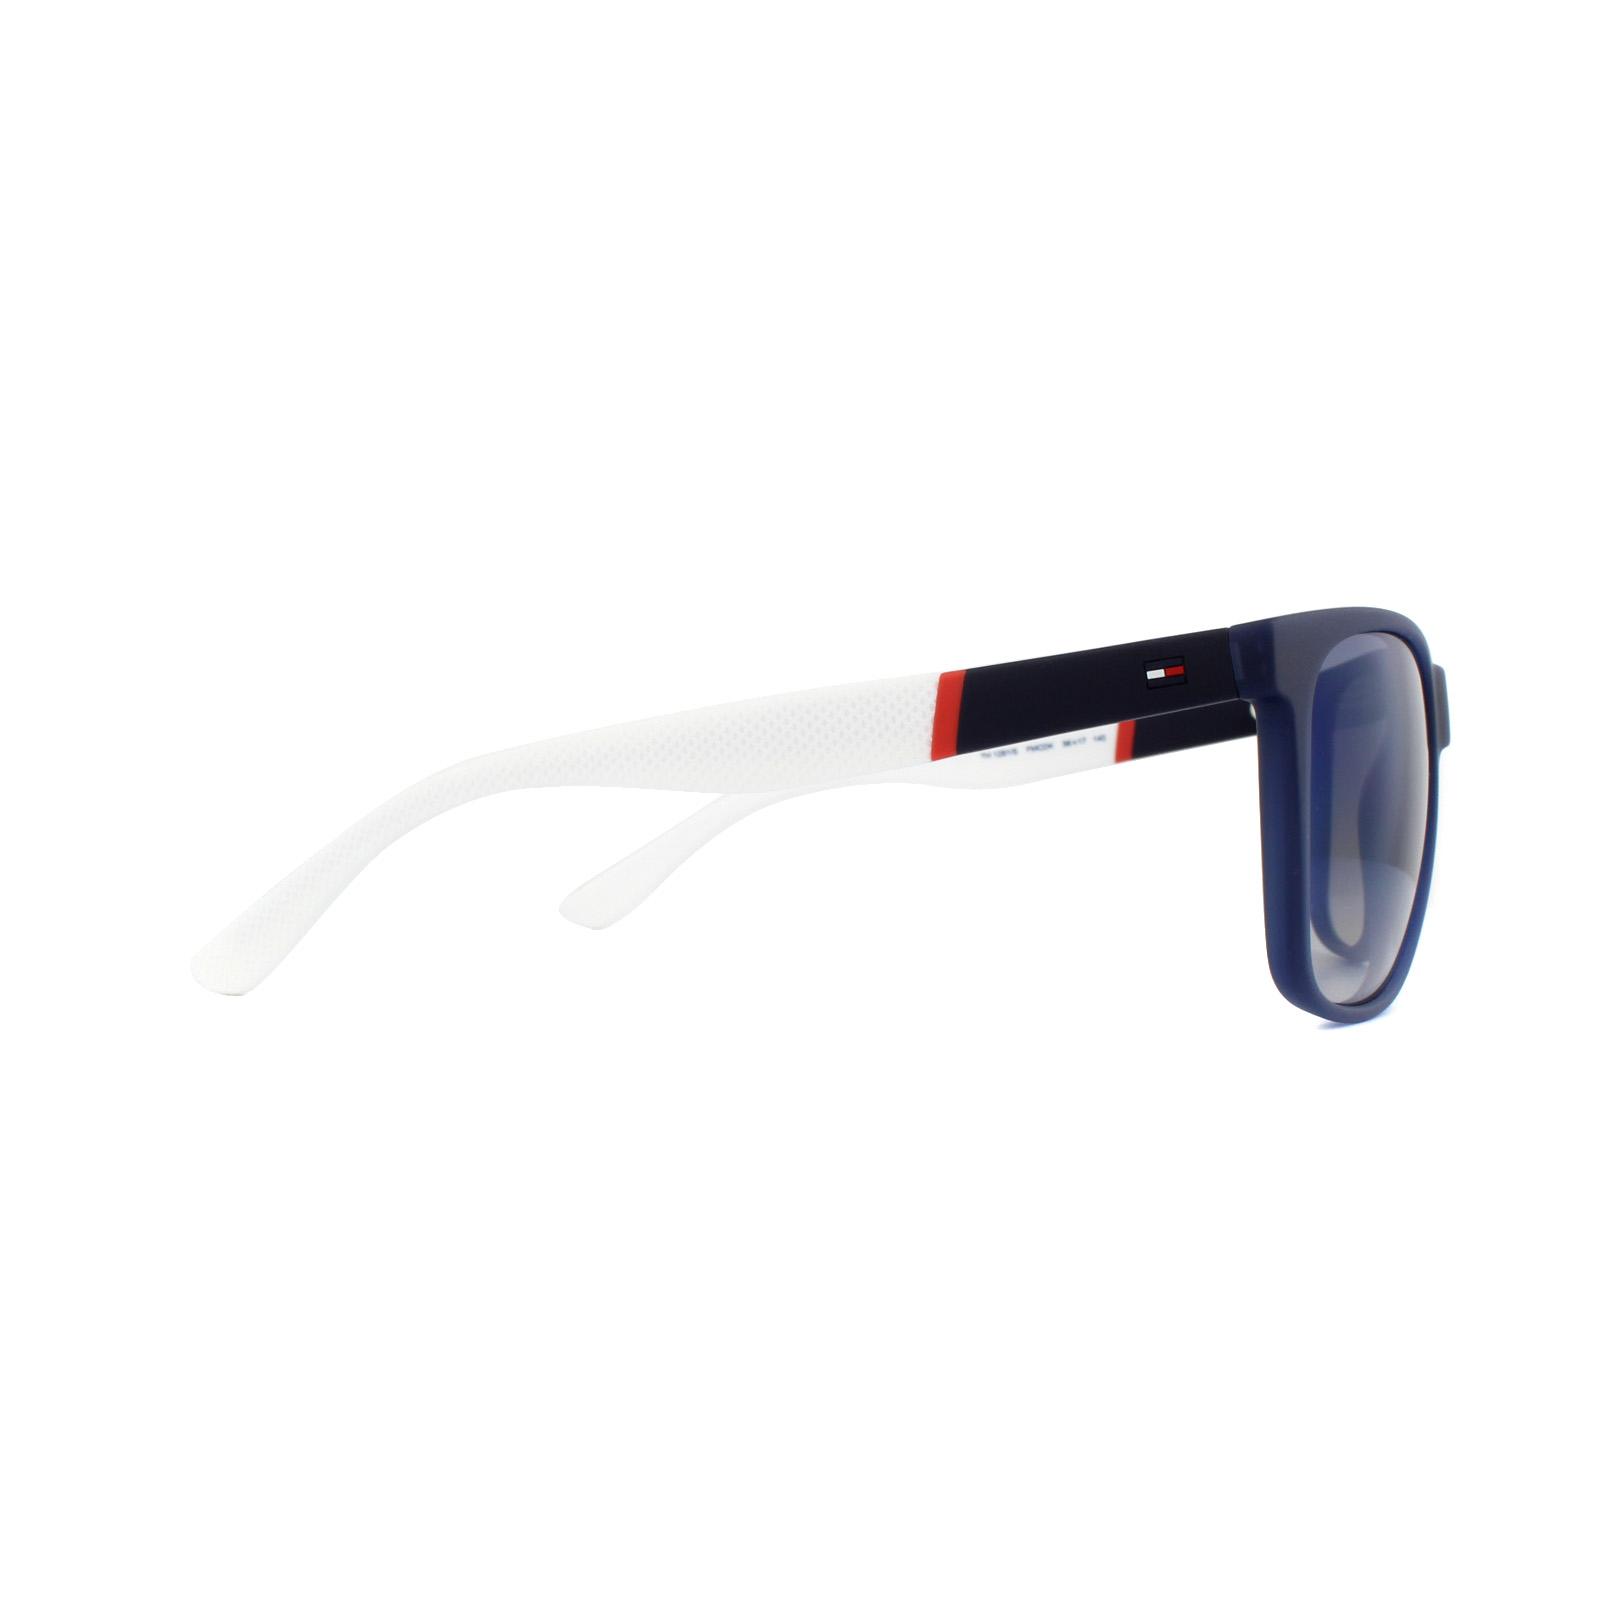 342d86573e Sentinel Tommy Hilfiger Sunglasses TH 1281 S FMC DK Blue Red White Blue Sky  Flash